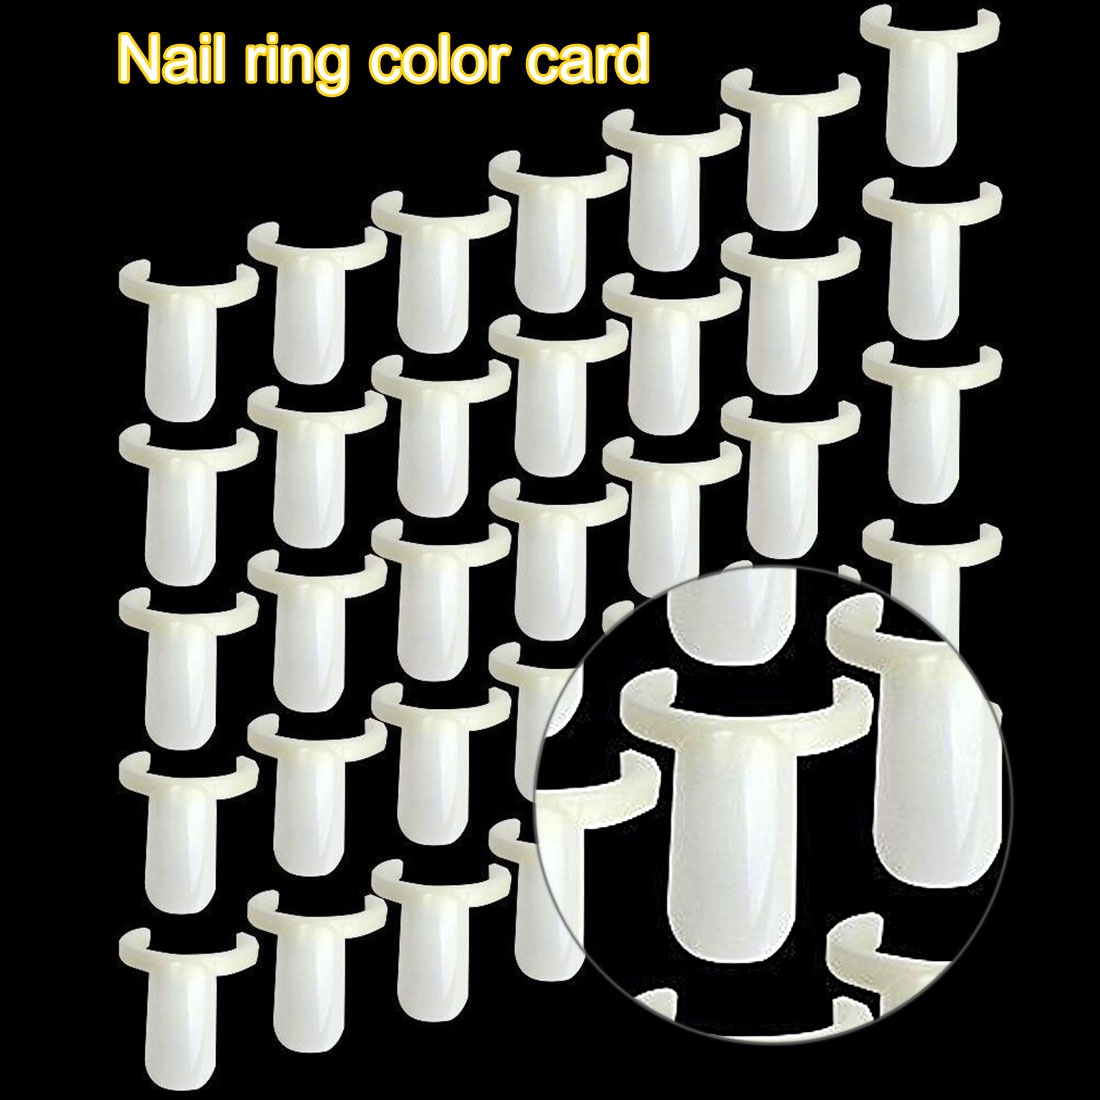 Salon 50PCS Acrylic Nail Polish UV Gel Plate Color Pops Bottle Display Nail Art Ring Style False Nail Tips Practice Tool